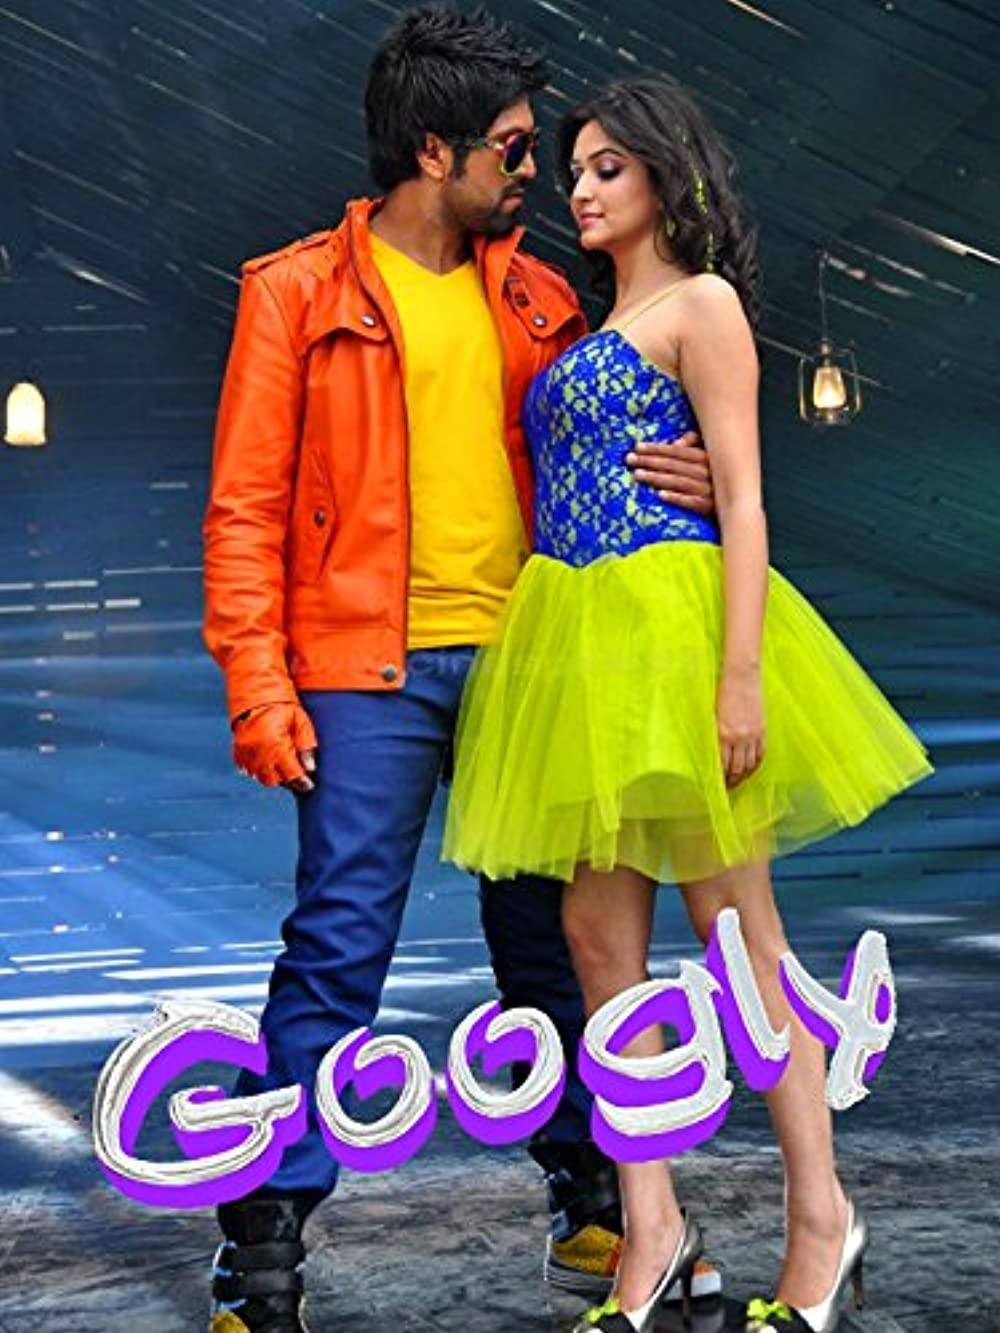 Googly Movie Poster